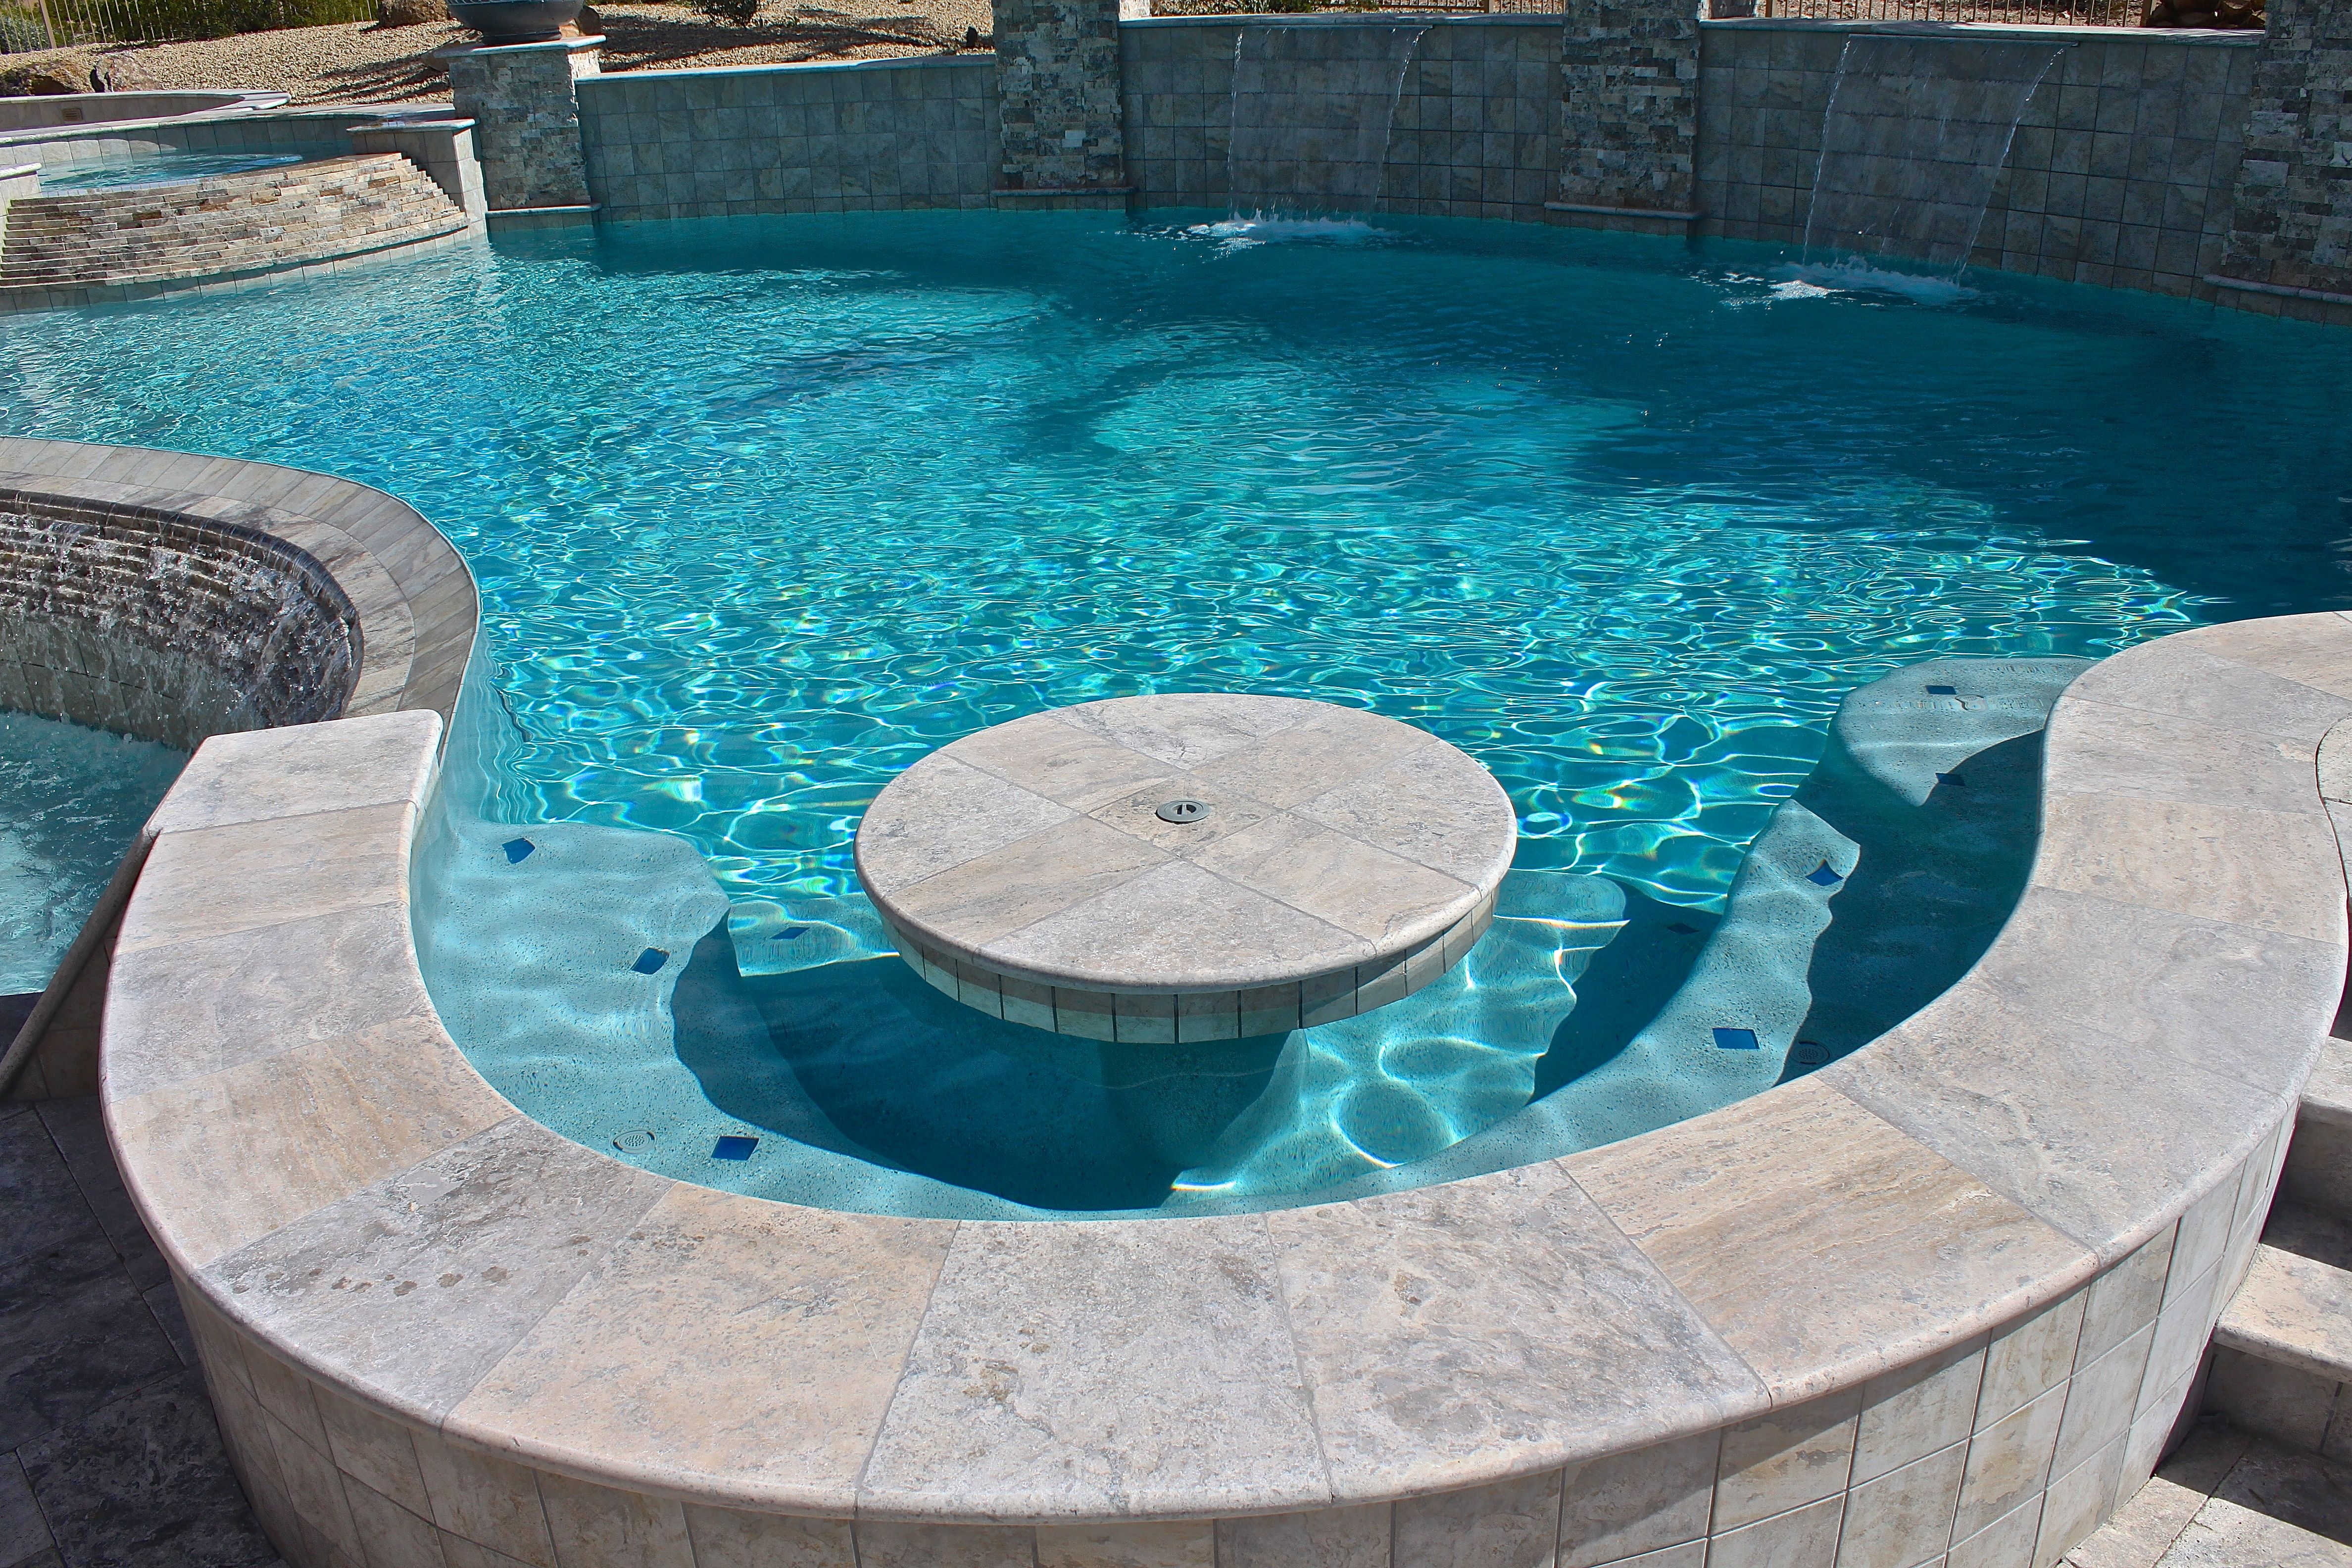 Pools Photo Gallery Custom Inground Pools Surprise Arizona Rainfall Freeform Pool With Bench And Table Inground Pool Designs Custom Inground Pools Pool